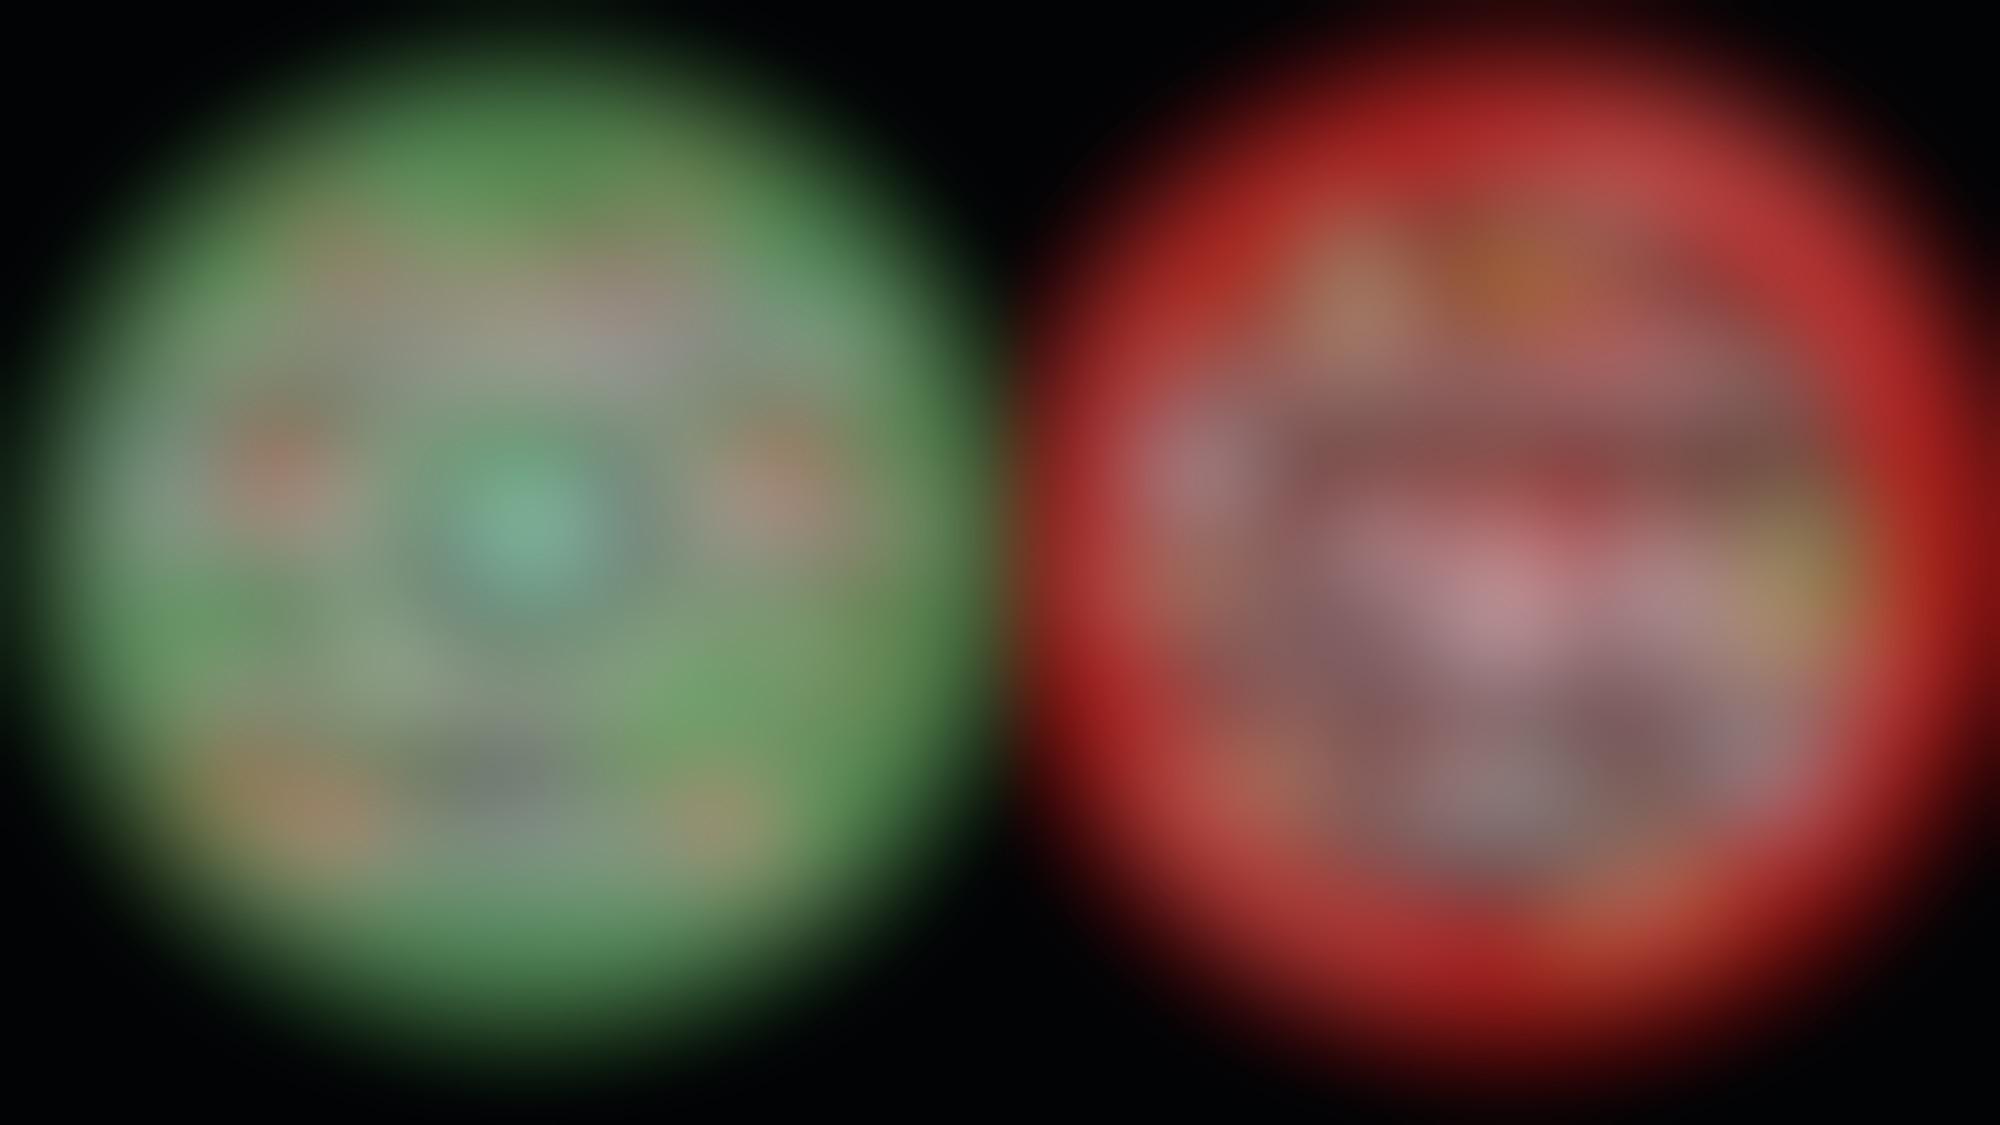 3 TOT AND PASTILLE autocompressfitresizeixlibphp 1 1 0max h2000max w3 D2000q80sd44fbd97c1dfd711caf88b2098480008